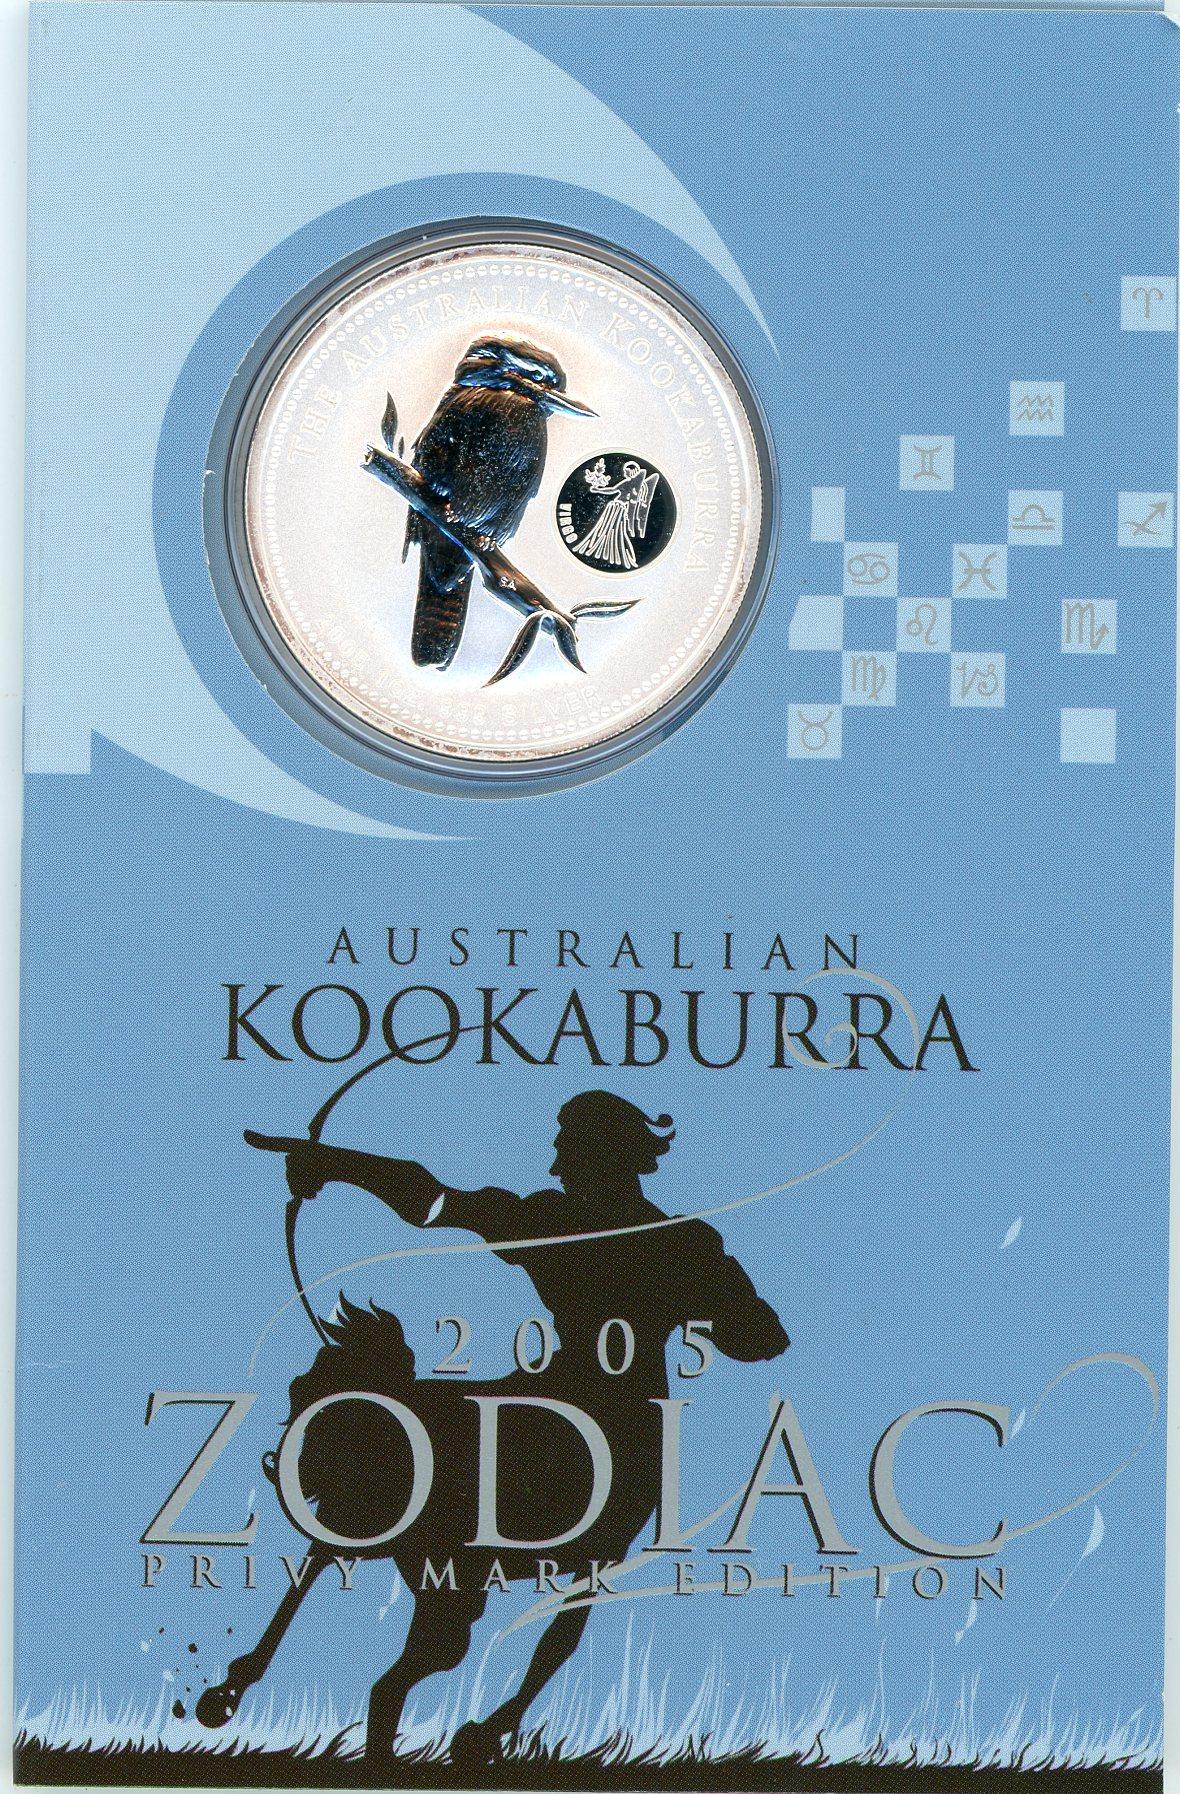 Thumbnail for 2005 1oz Kookaburra with Virgo Privy Mark